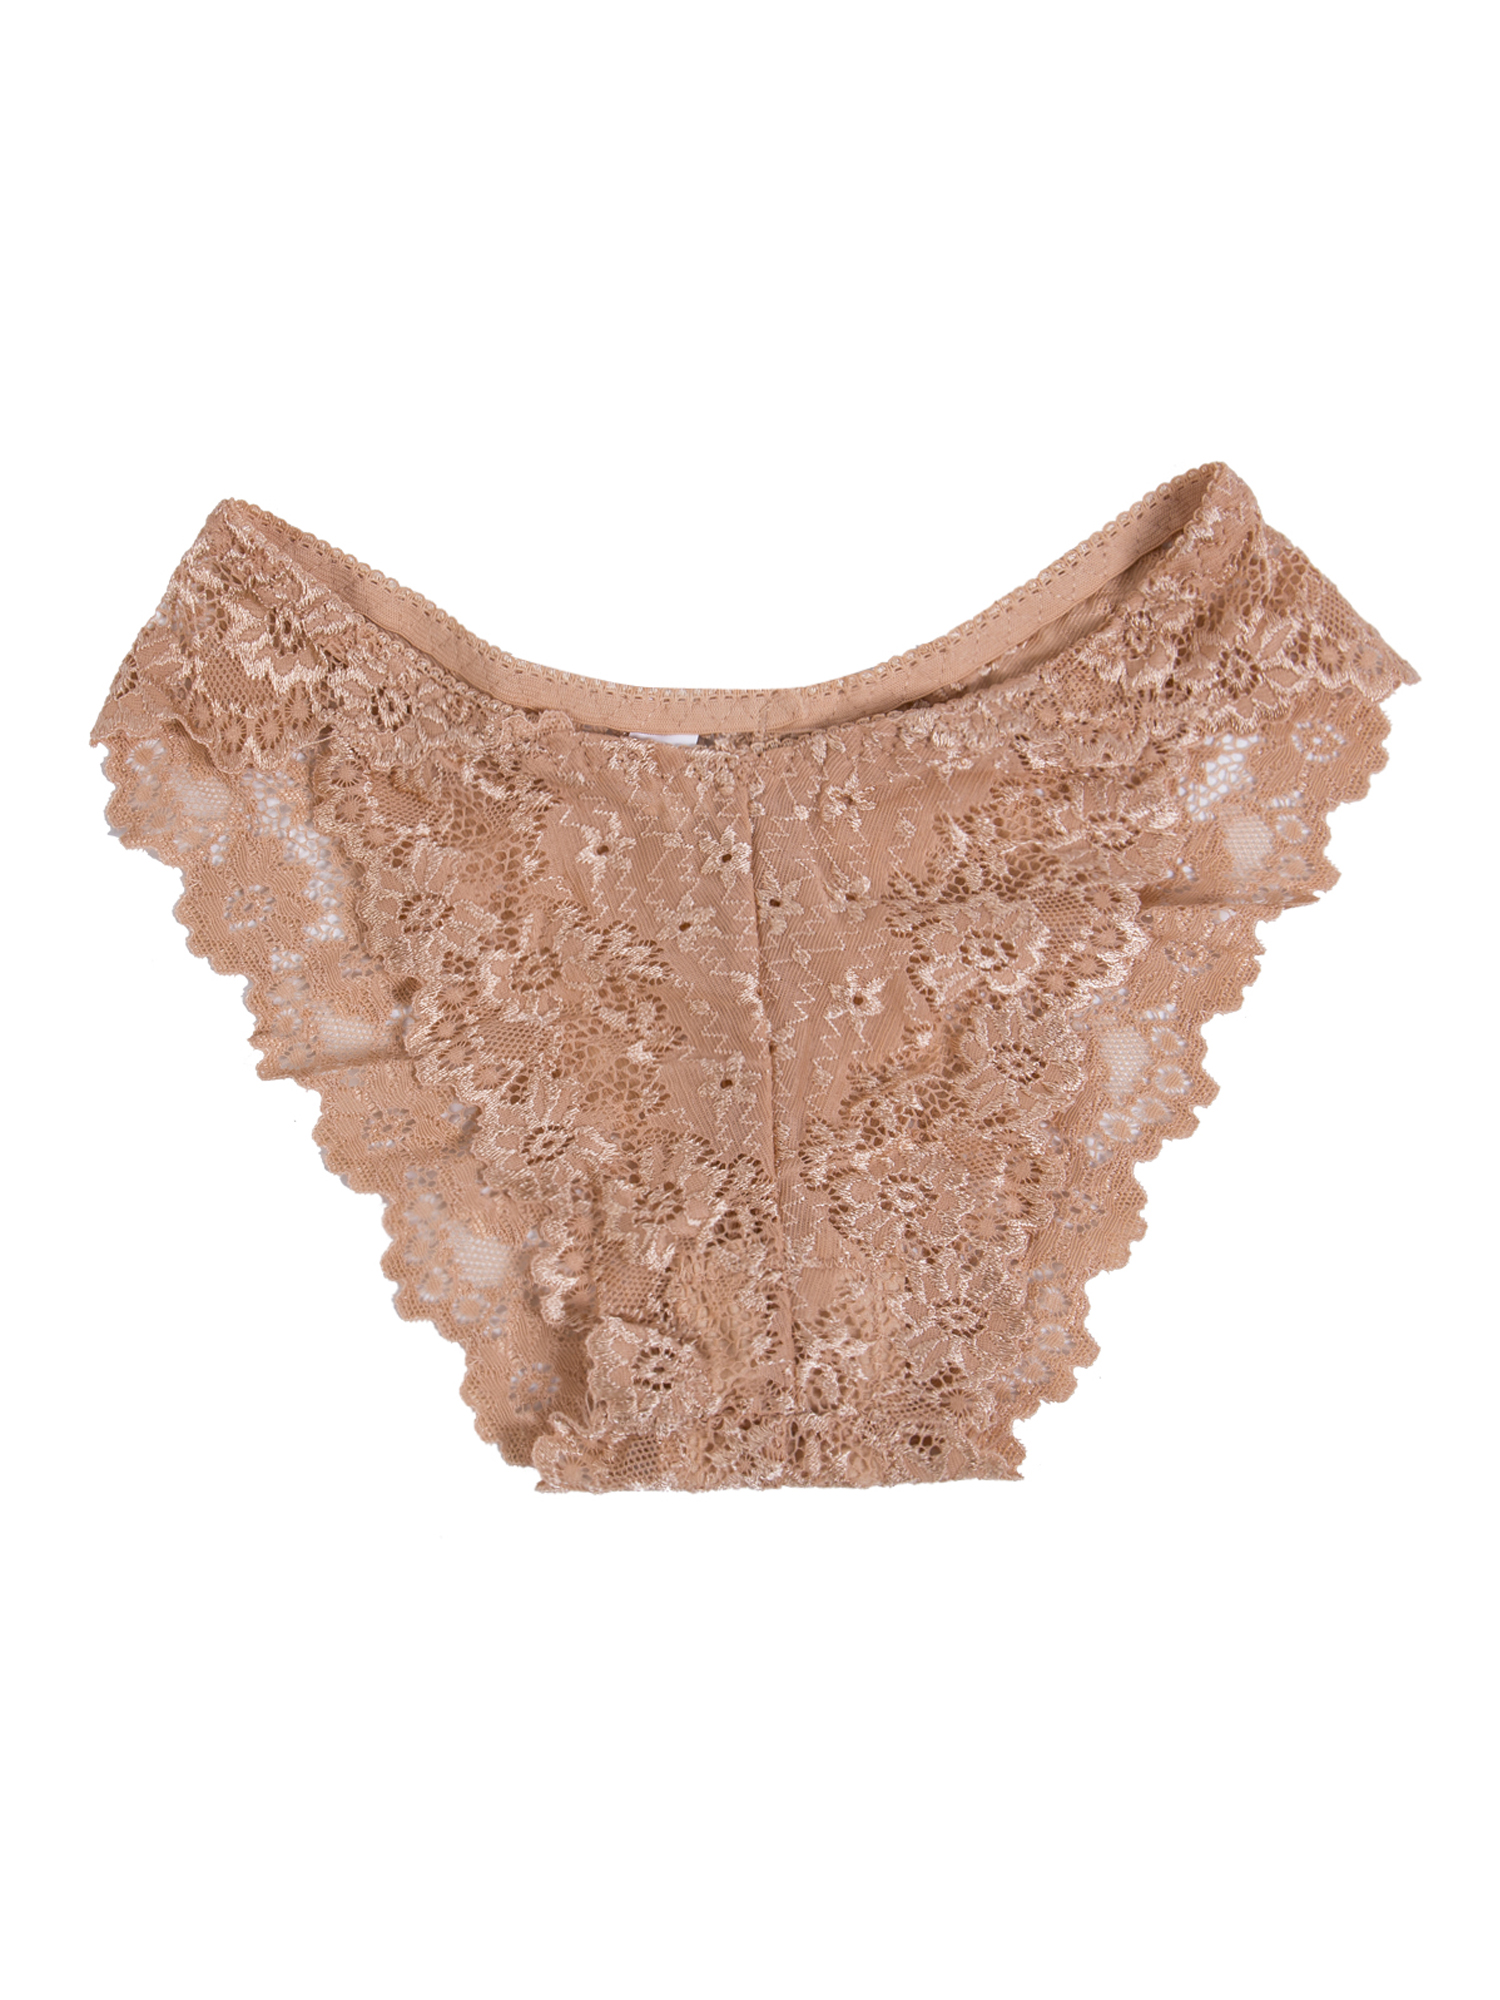 17 color New Handmade Sissy BRASILIAN Panties Sheer Nylon Panty Briefs Underwear Lace Leg Trimmed Front Lacy Undies Lingerie Fair Pink